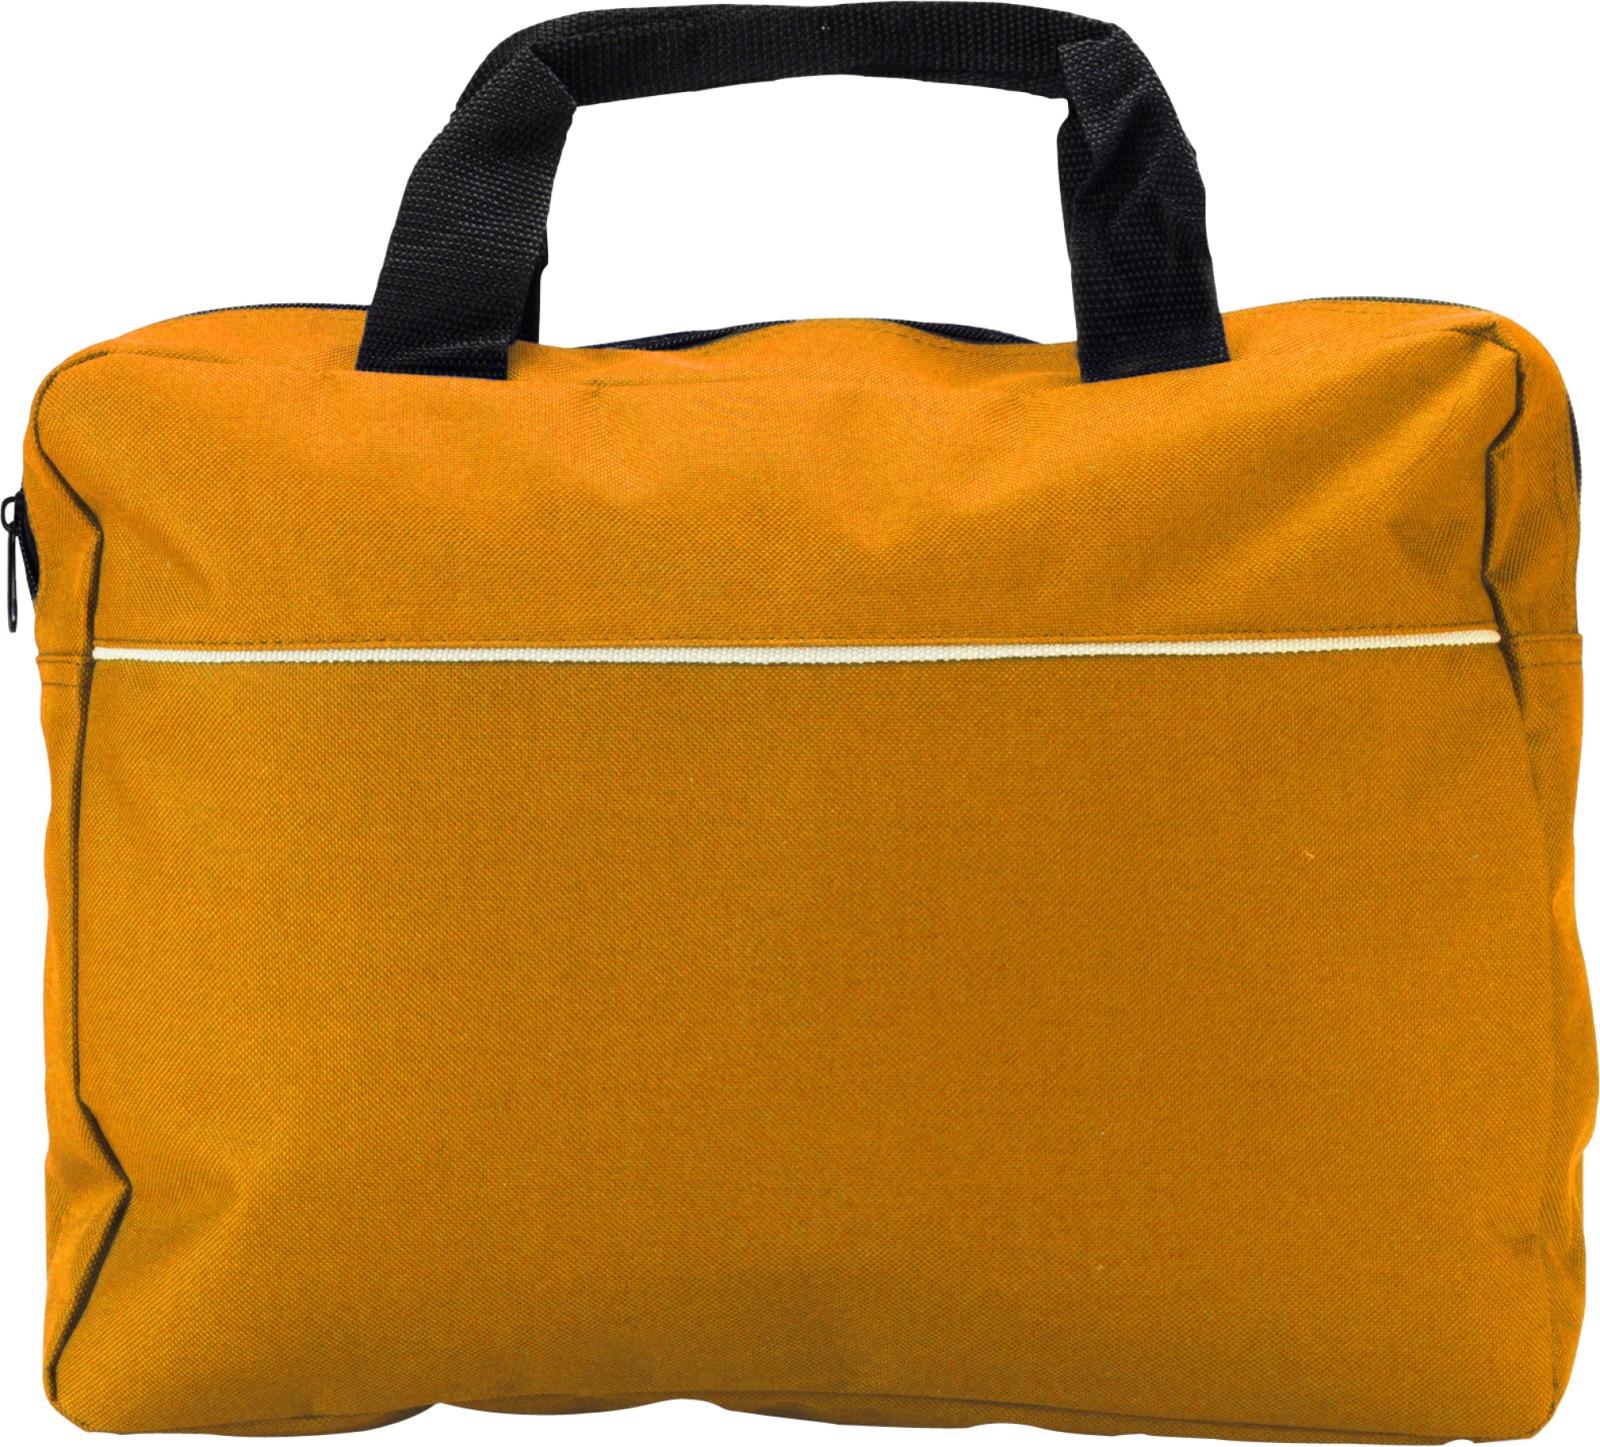 Polyester (600D) document bag - Orange